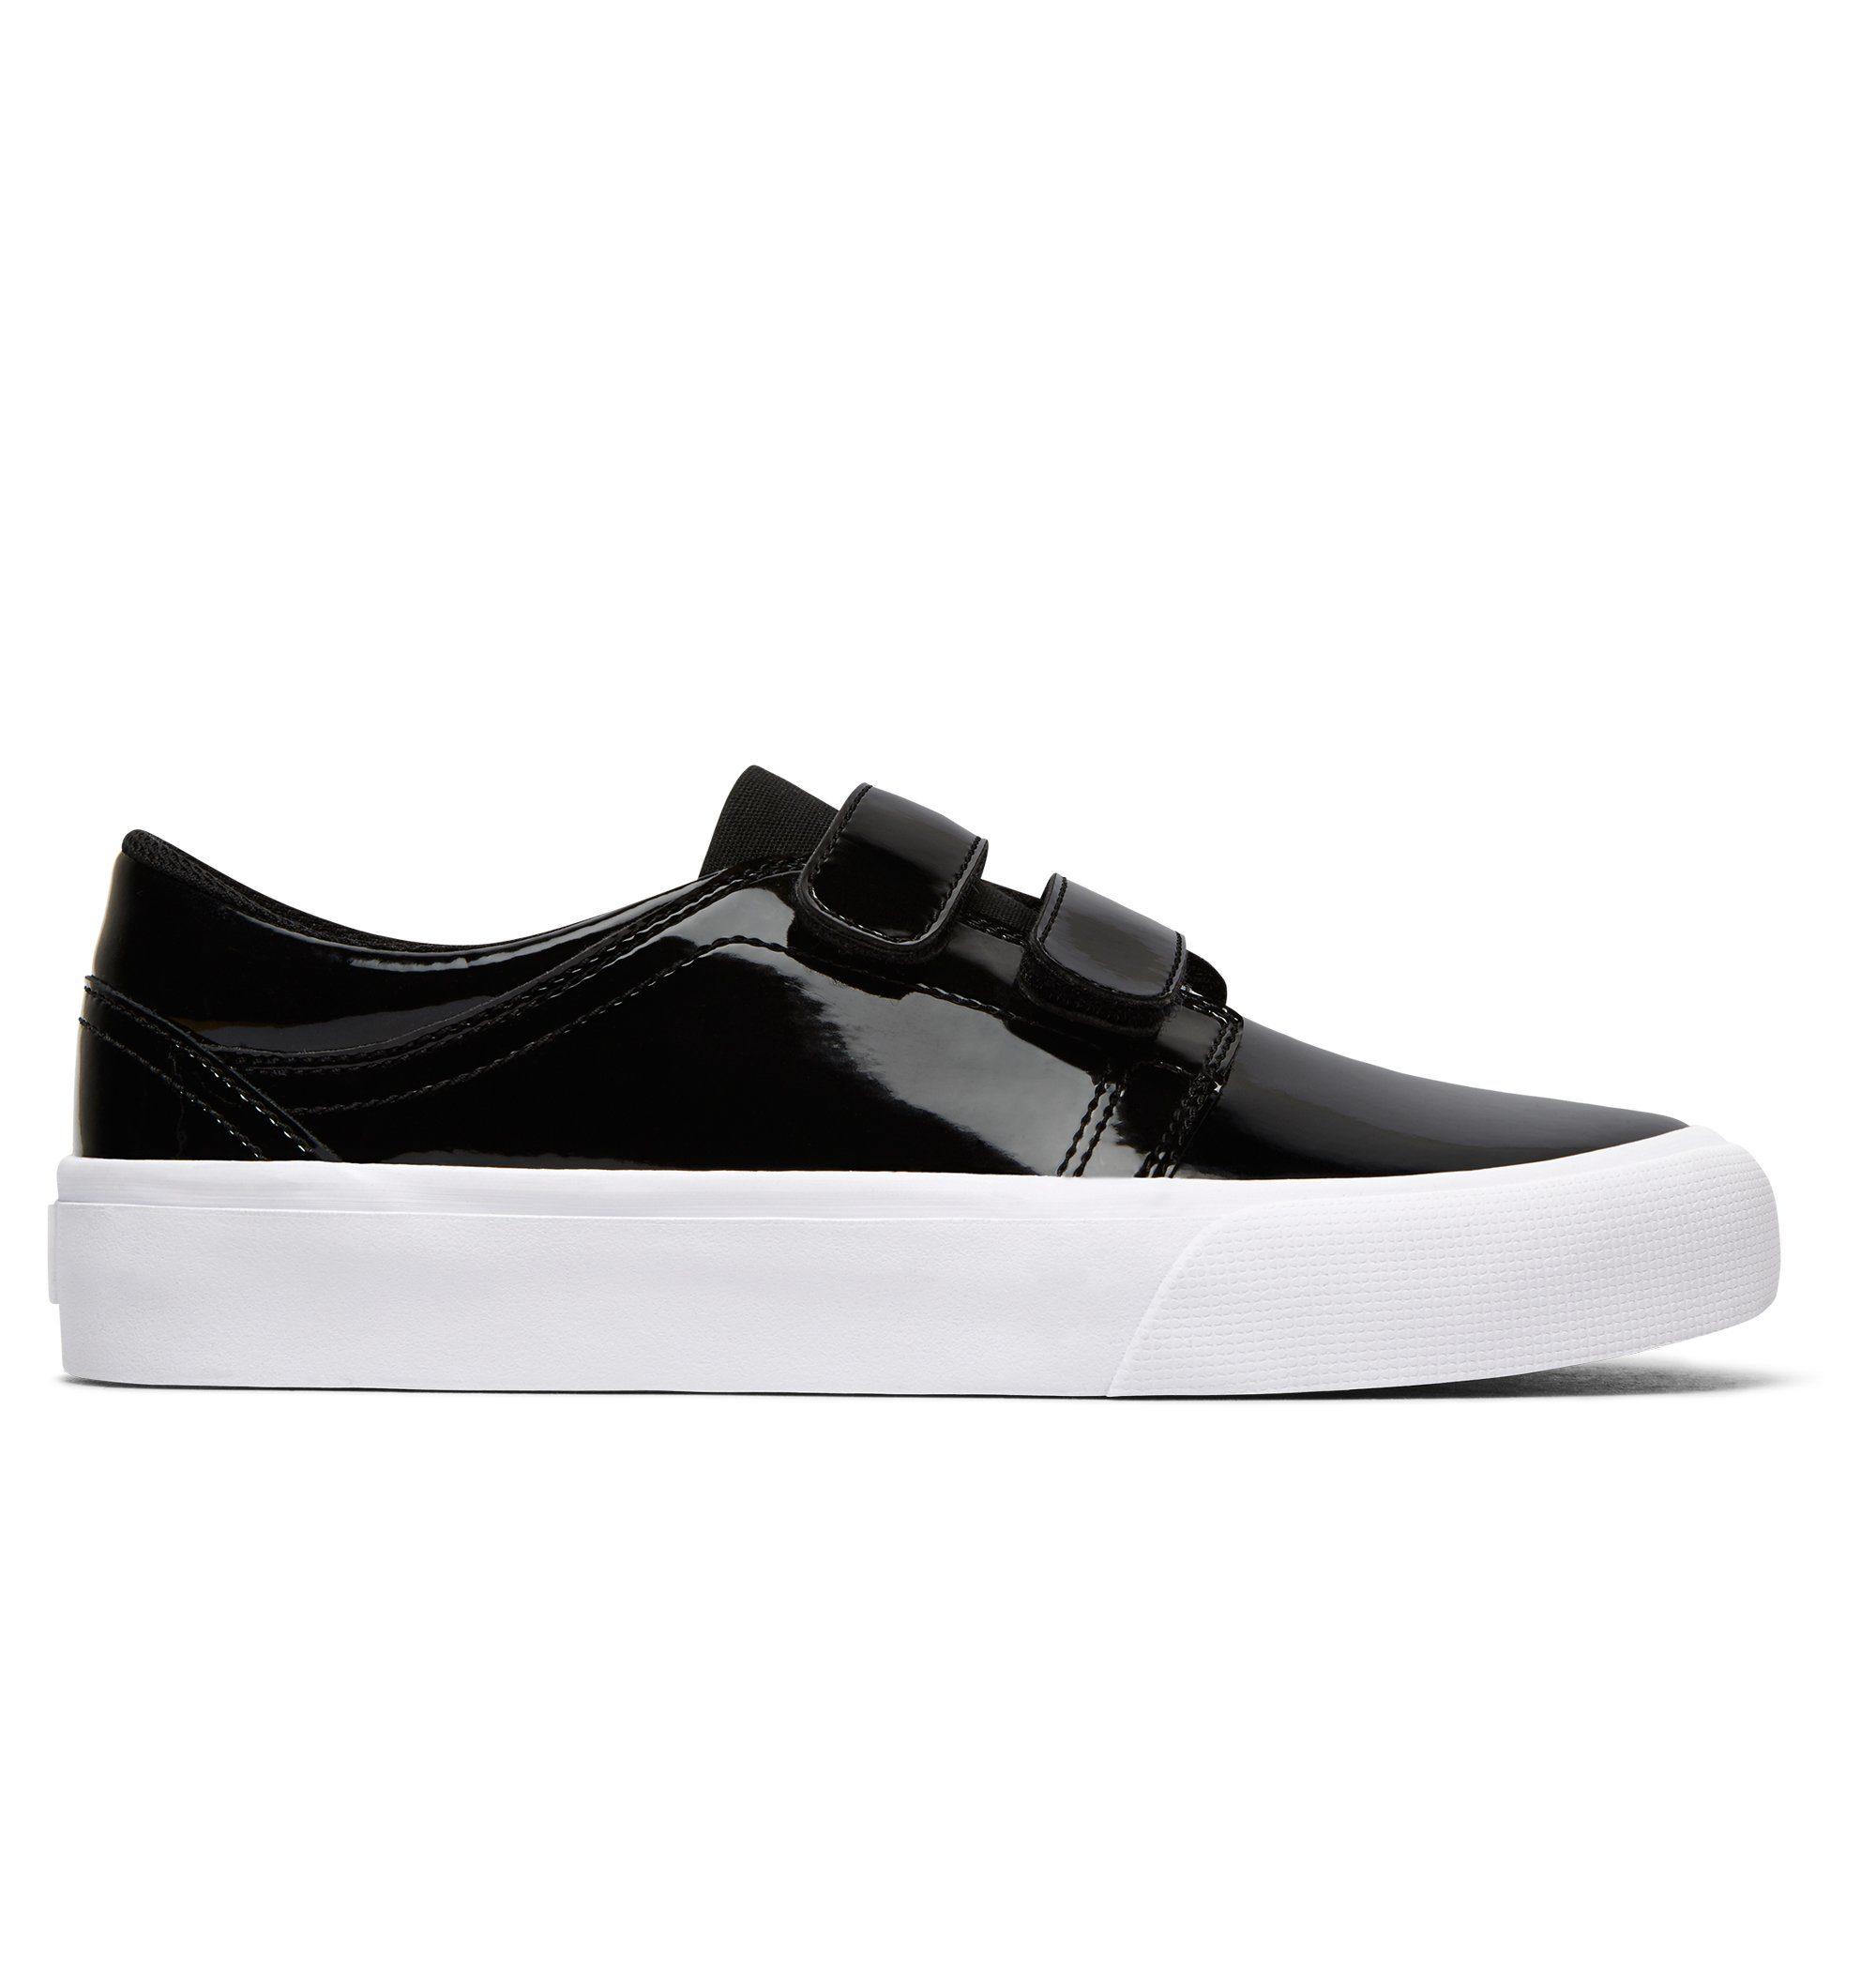 DC Shoes Schuhe Trase V SE online kaufen  Black#ft5_slash#black#ft5_slash#white